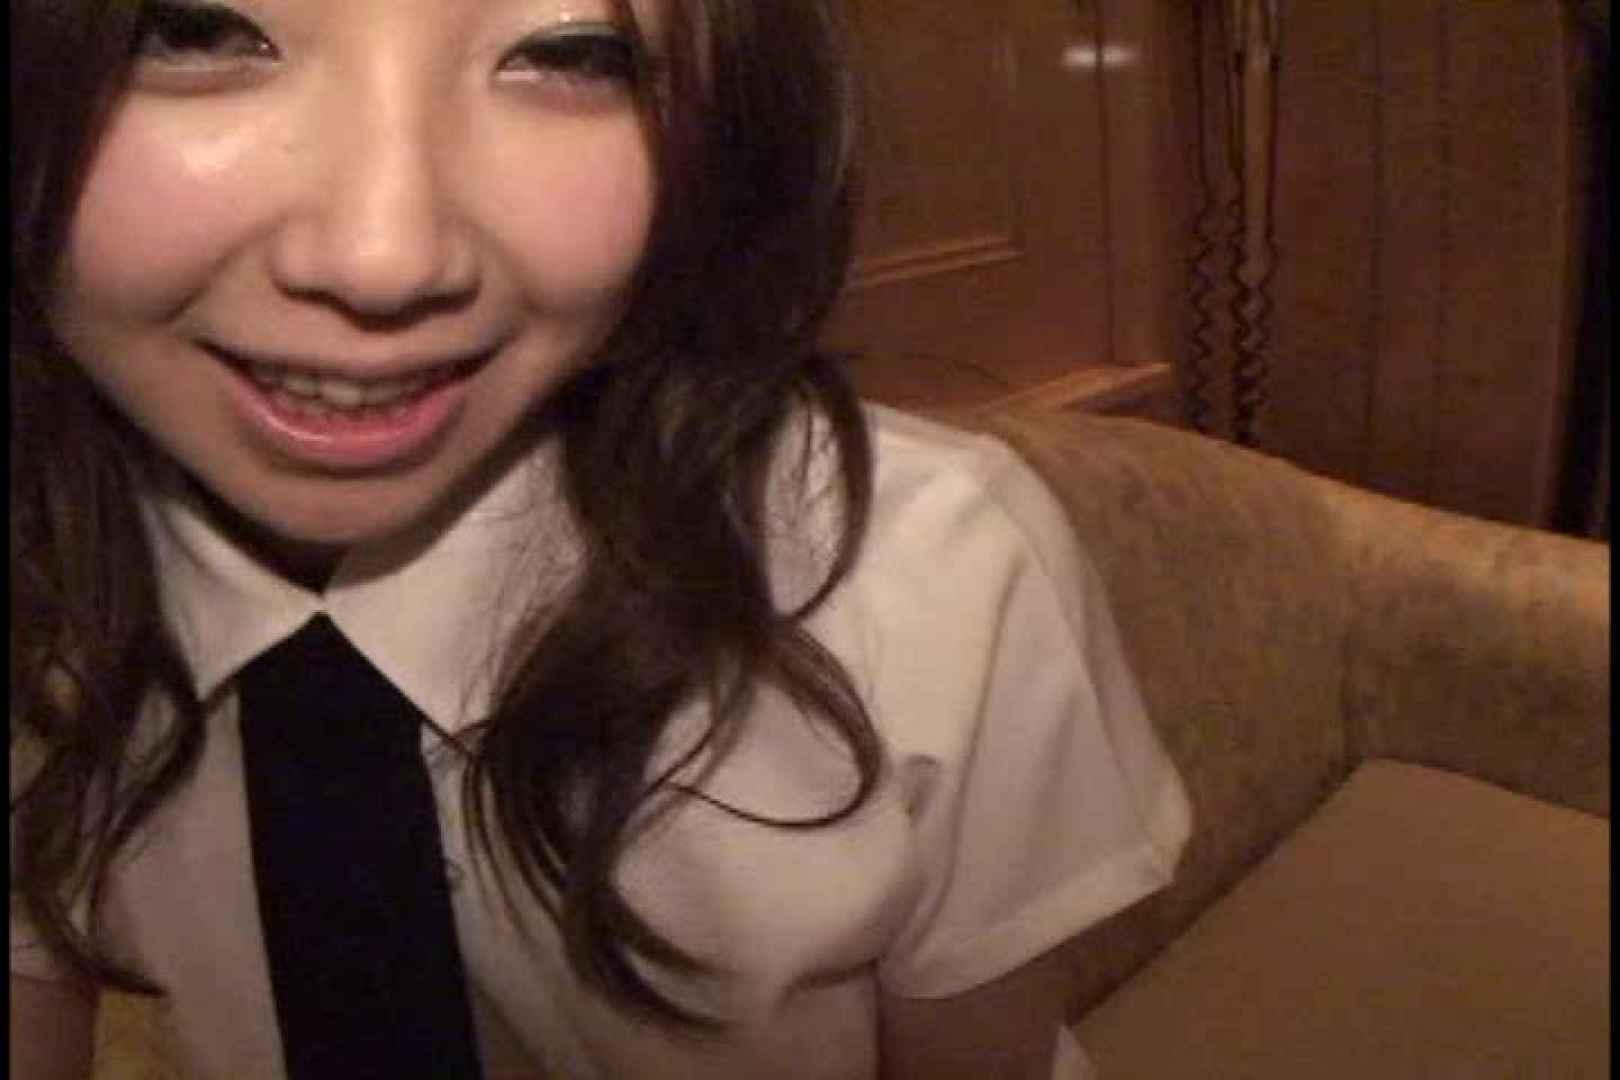 JDハンター全国ツアー vol.041 前編 女子大生のエロ動画  85PIX 72